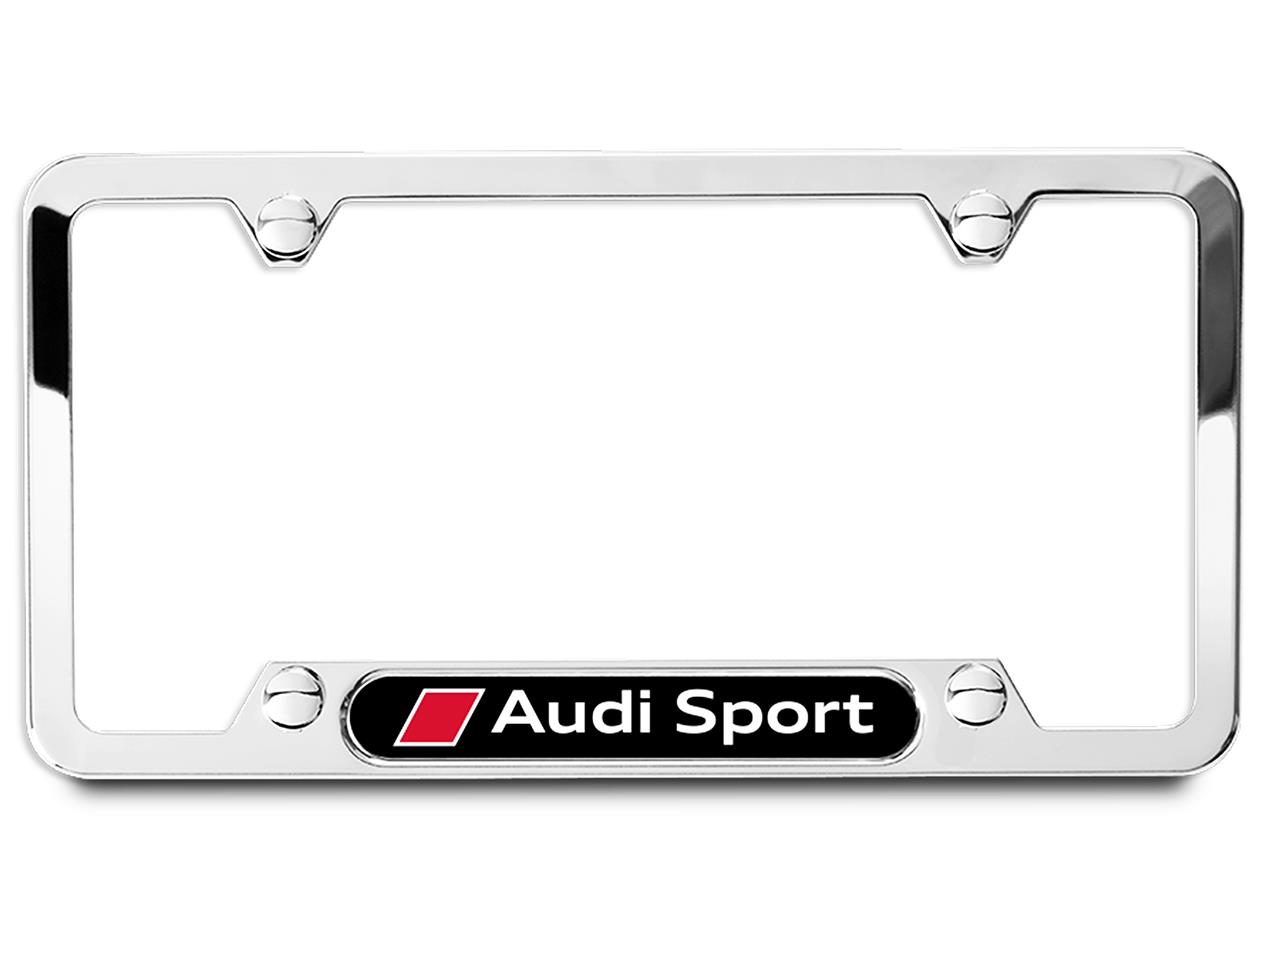 2018 Audi SQ5 Genuine Accessories